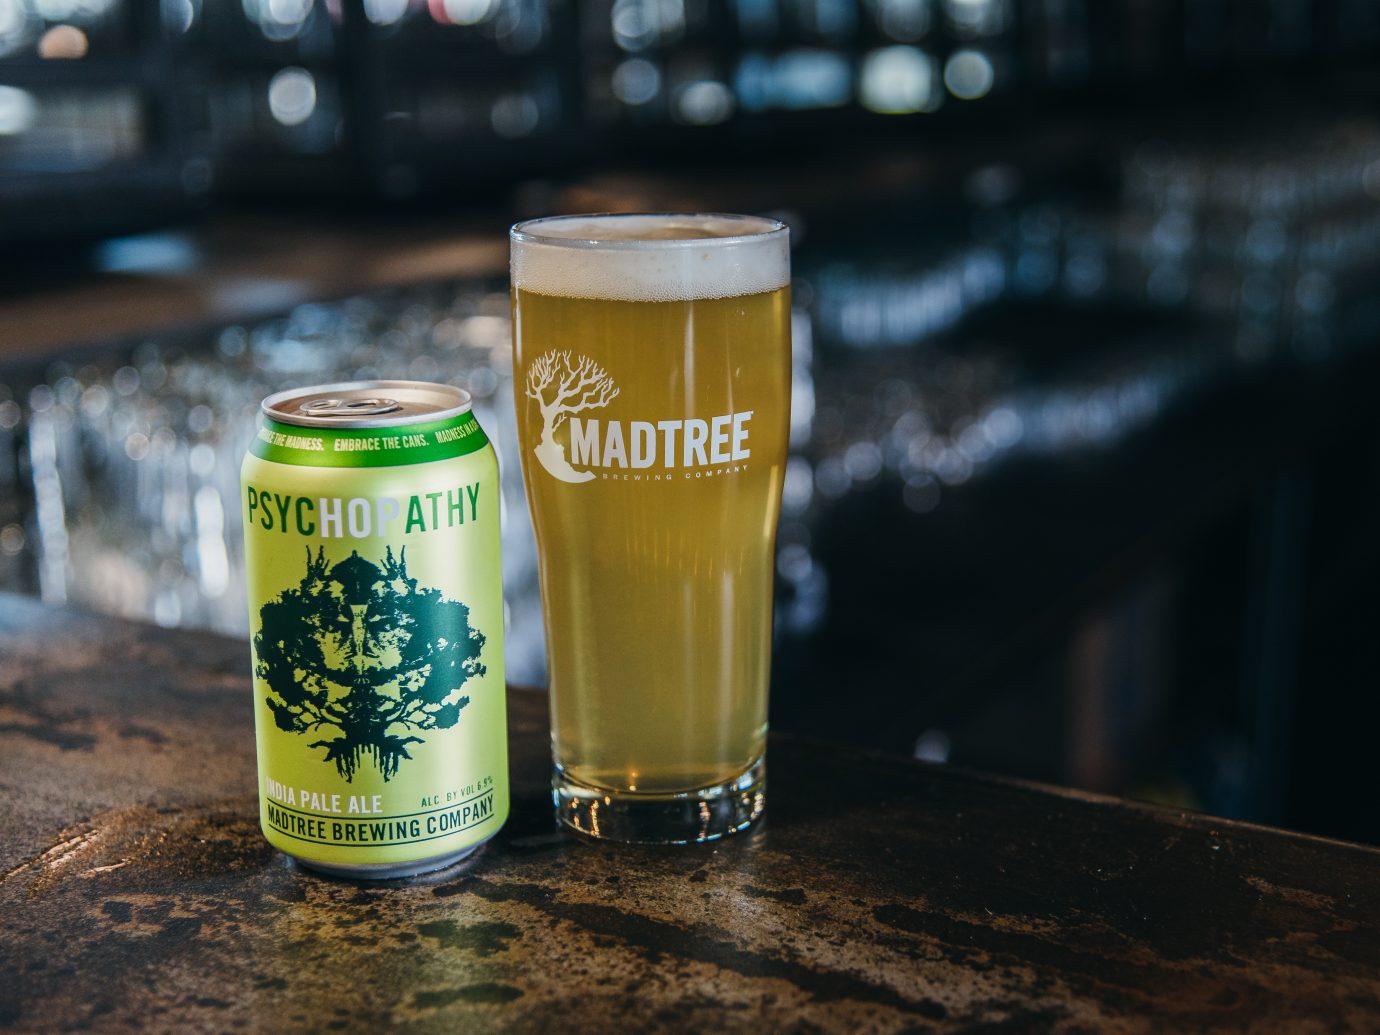 MadTree craft beers